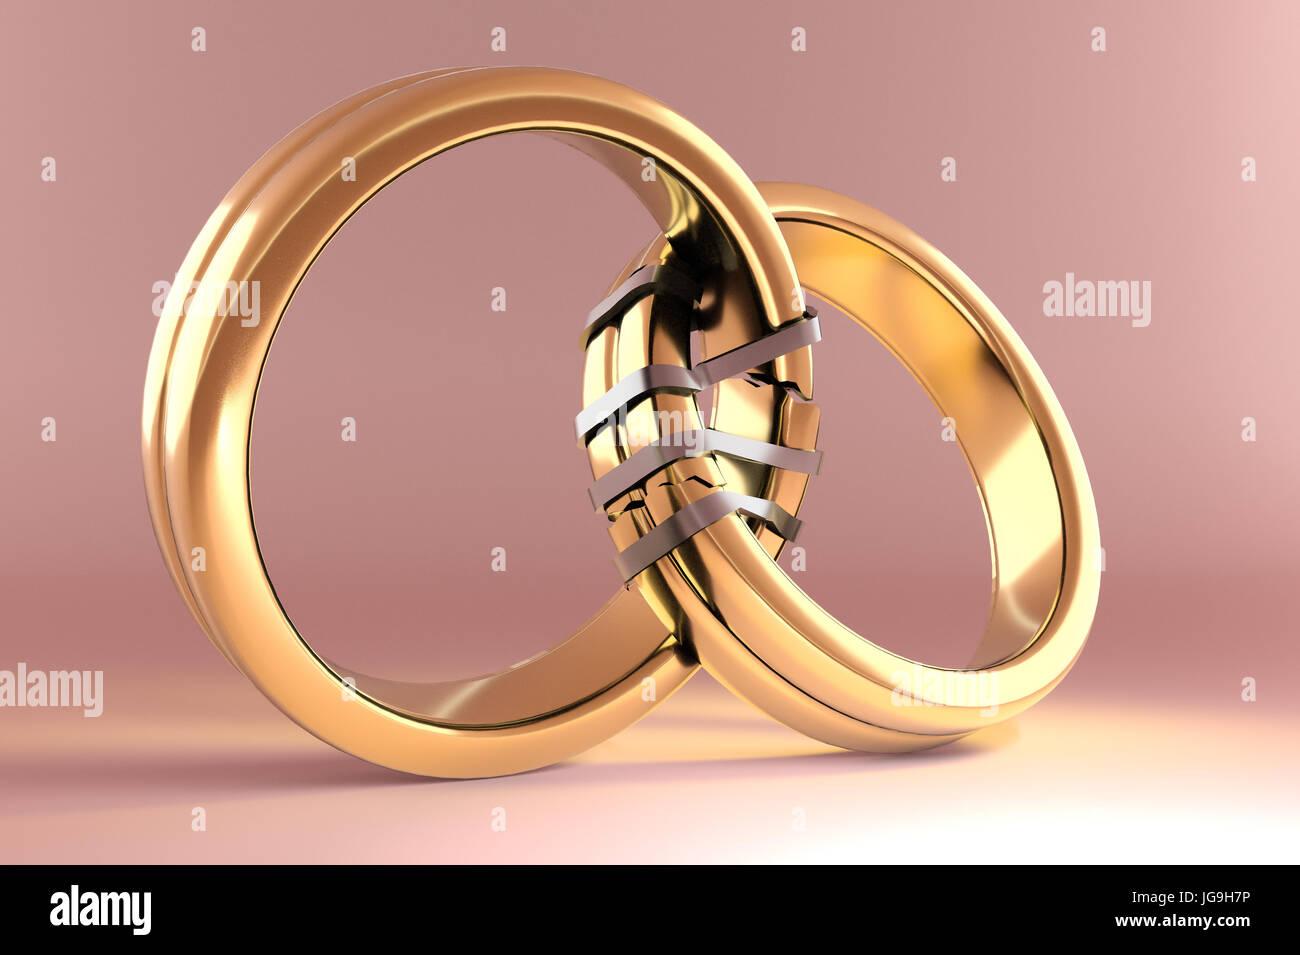 Broken Wedding Rings Stock Photos & Broken Wedding Rings Stock ...